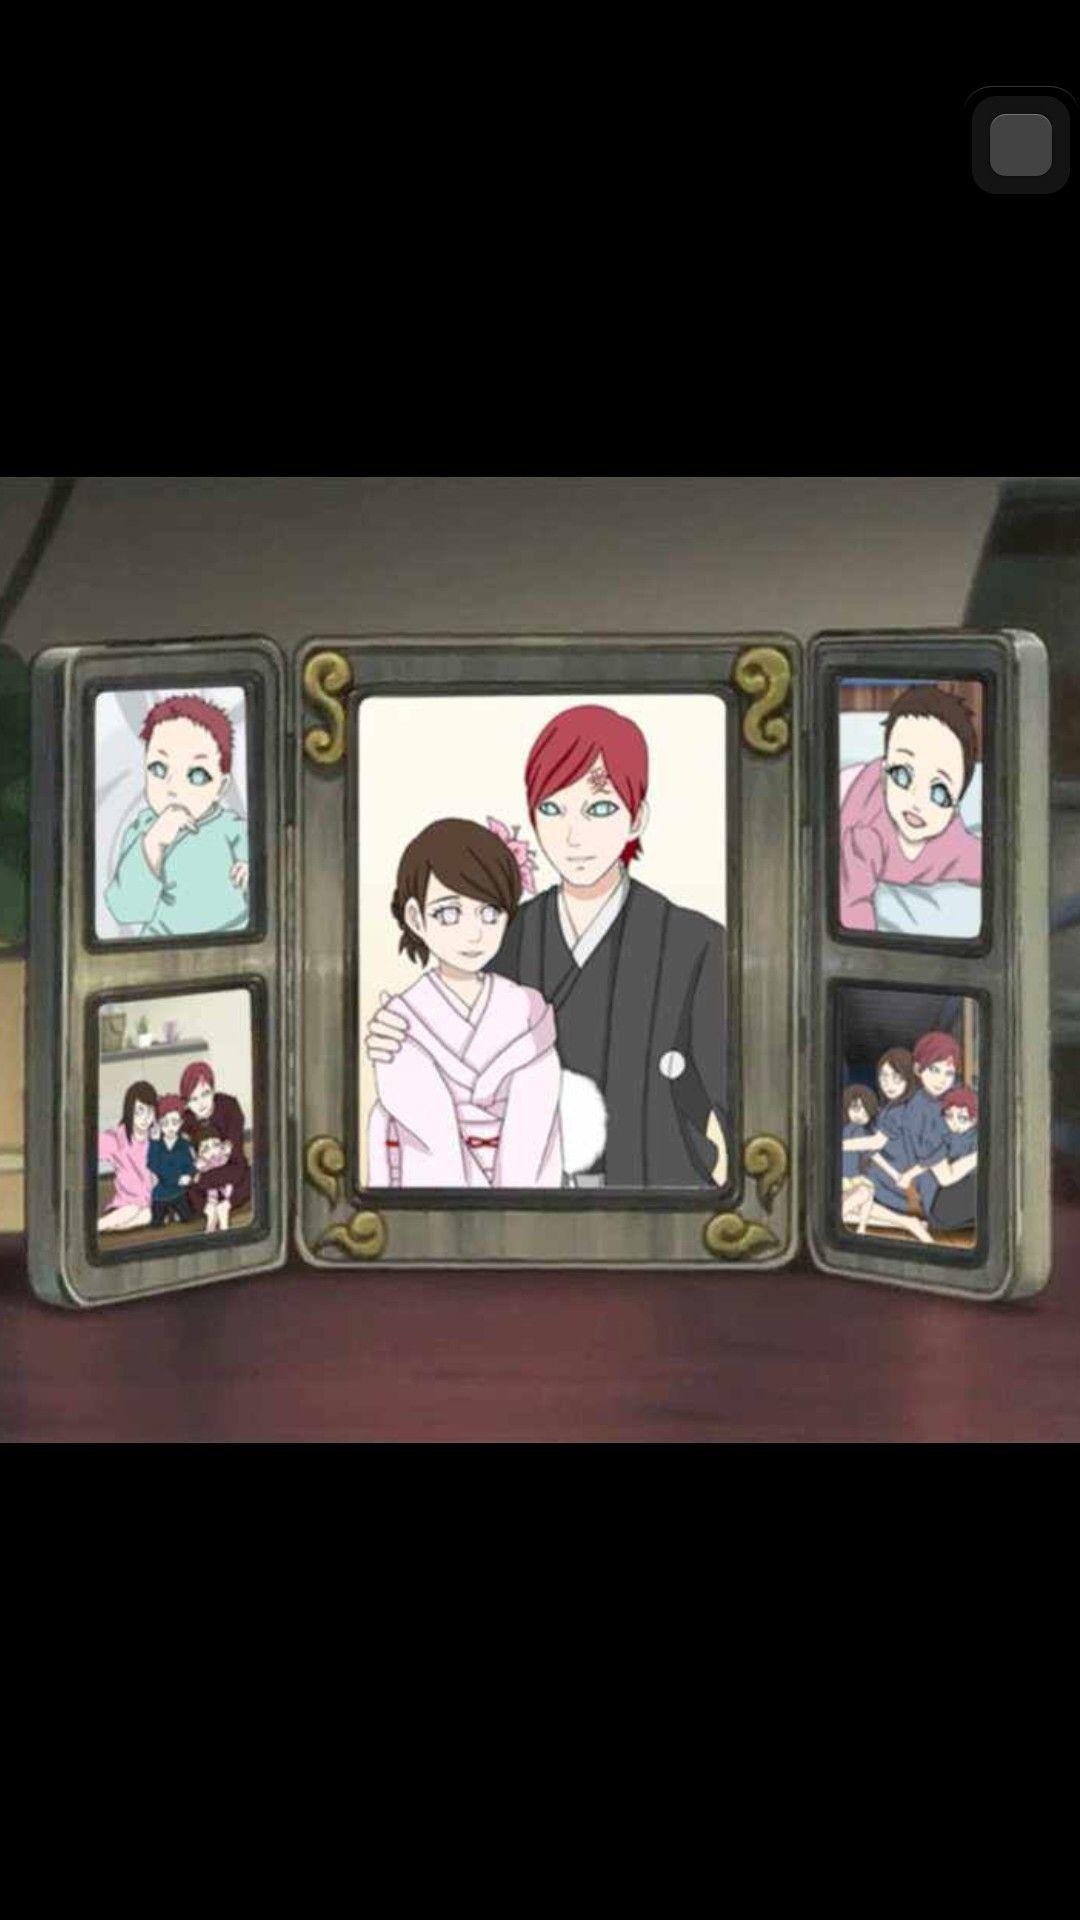 gaara and hikari hyuuga ������ love couple family